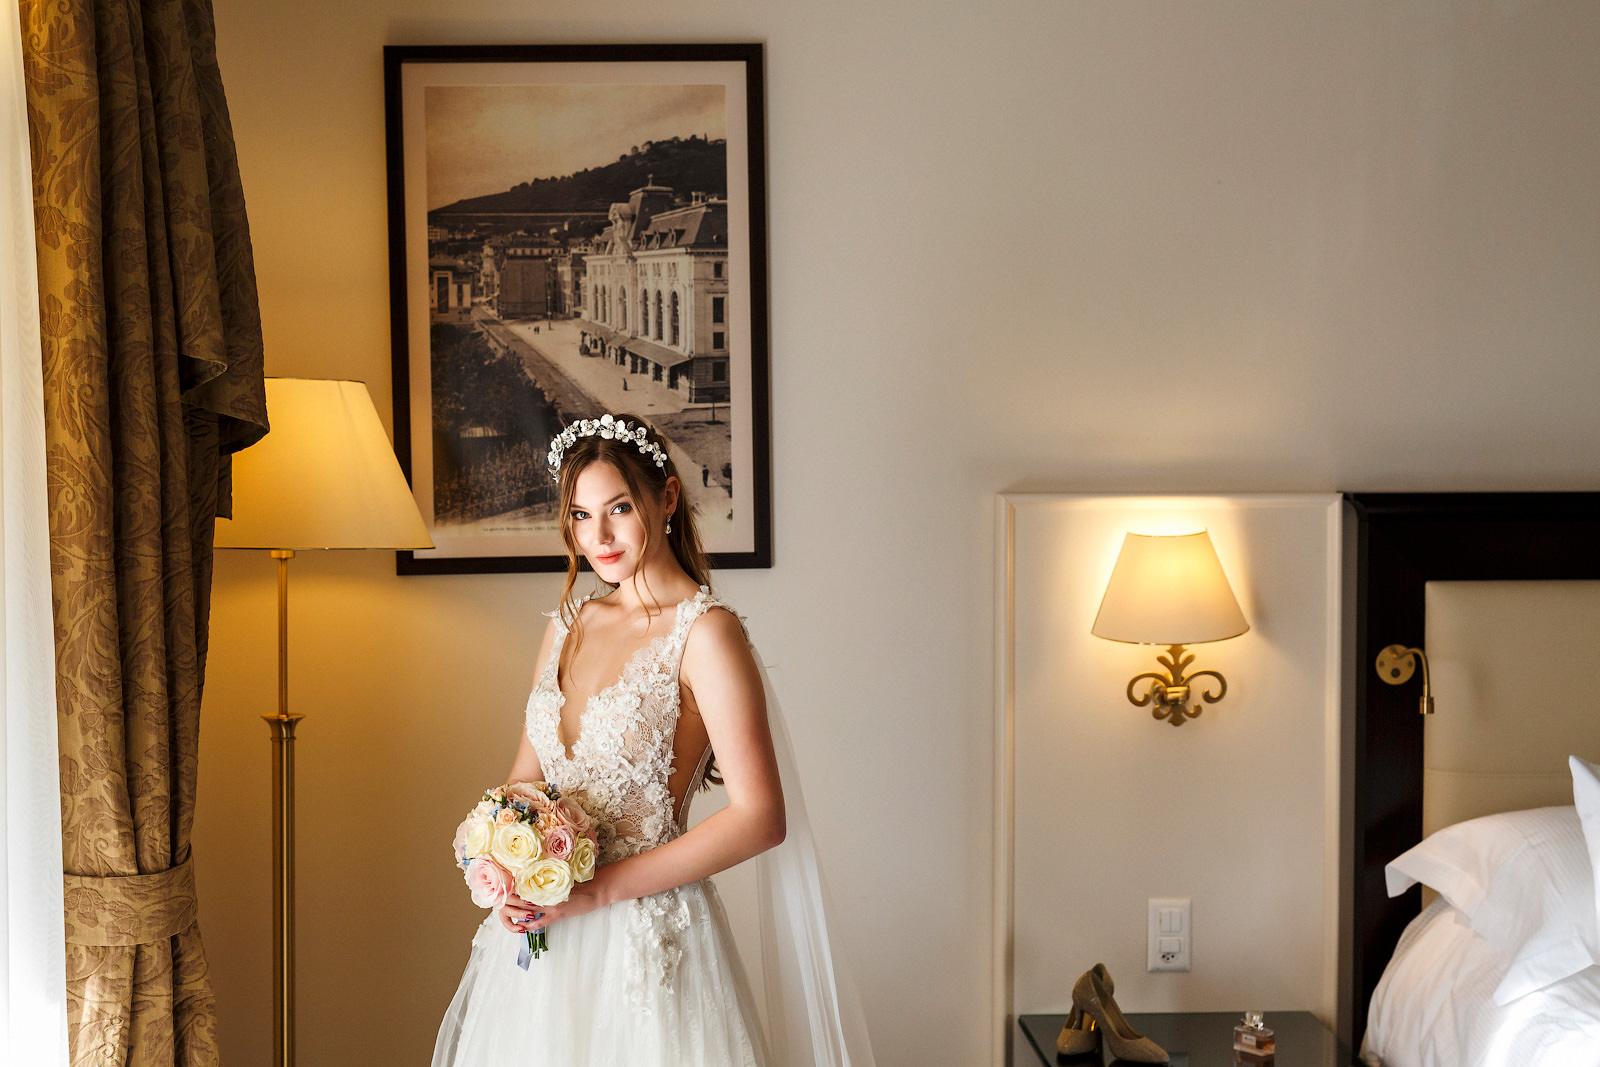 Einzelcoaching via Skype | Hochzeitsfotografie Business Strategie Session